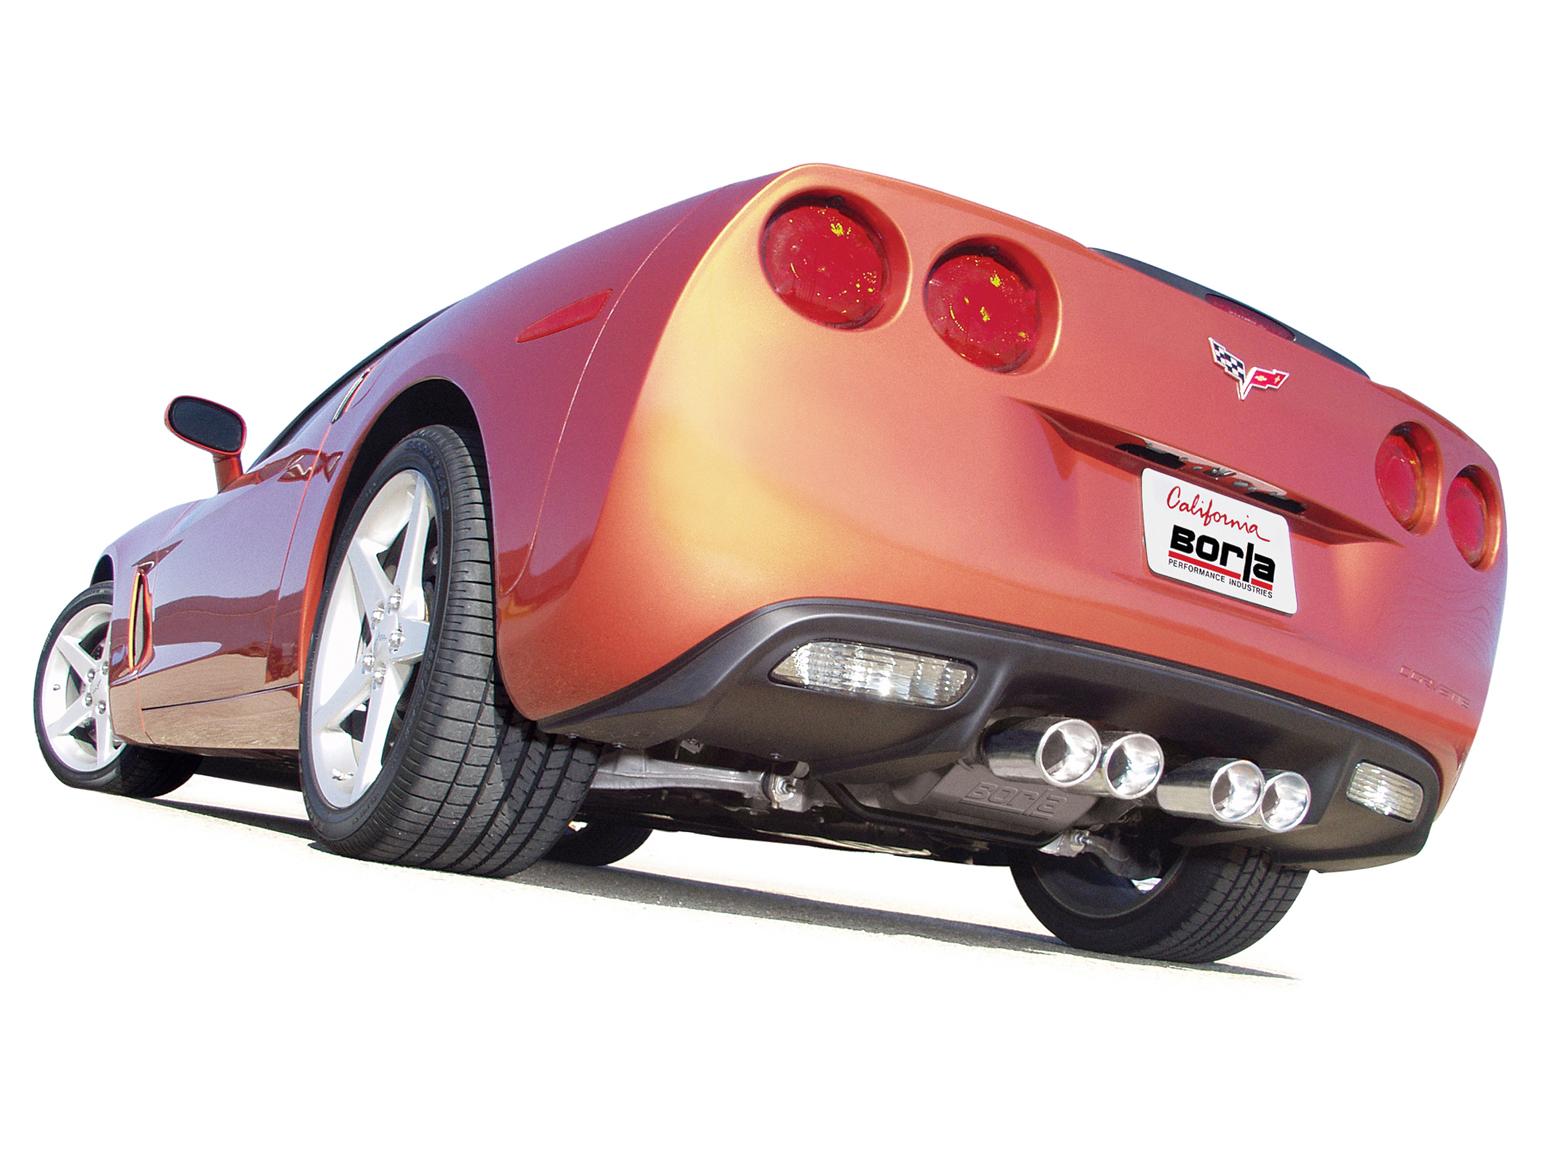 corvette exhaust system, corvette borla exhaust